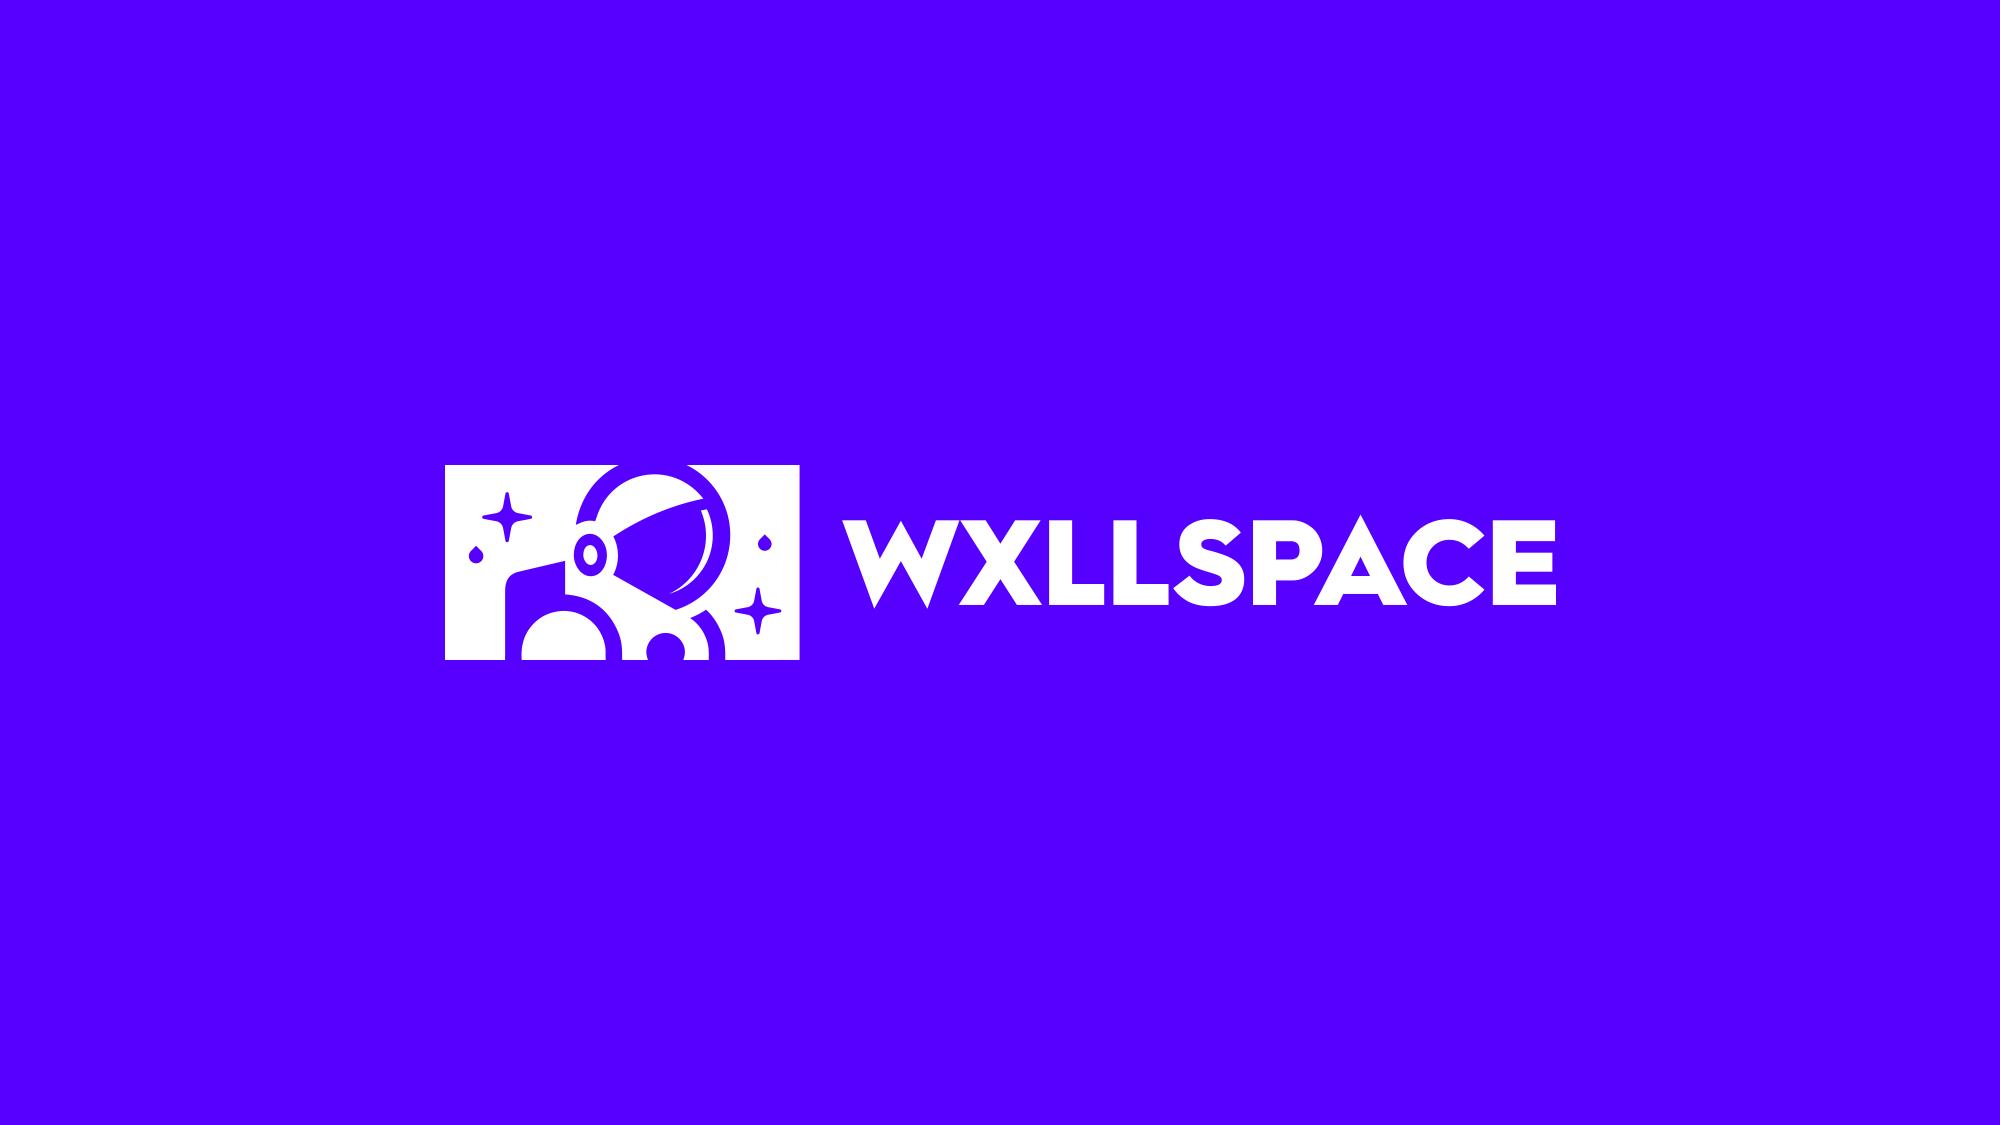 wallspacelogo purple